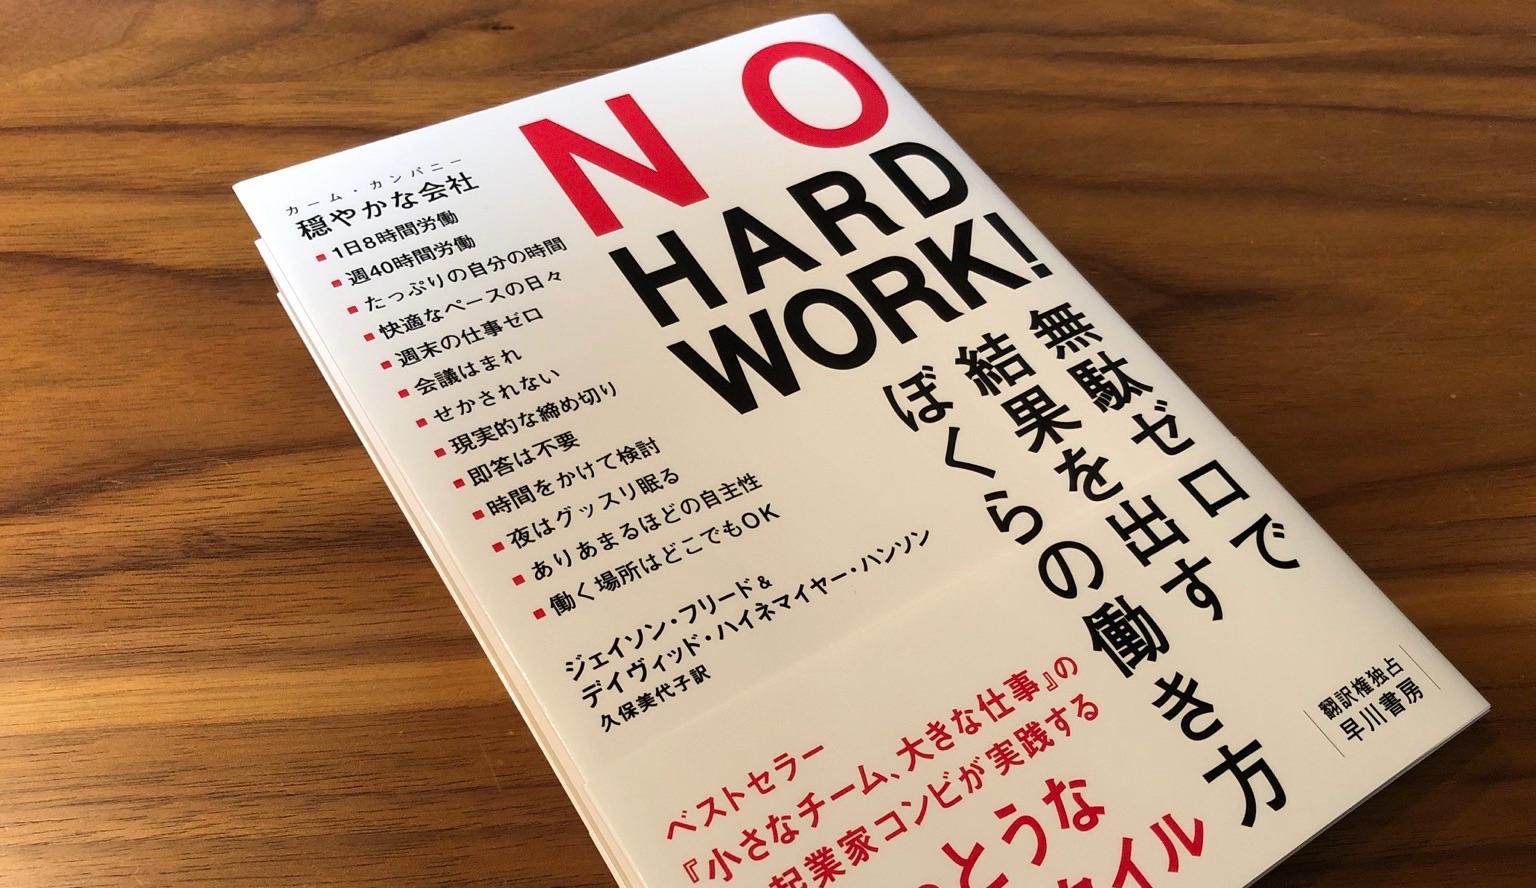 NO HARD WORK!